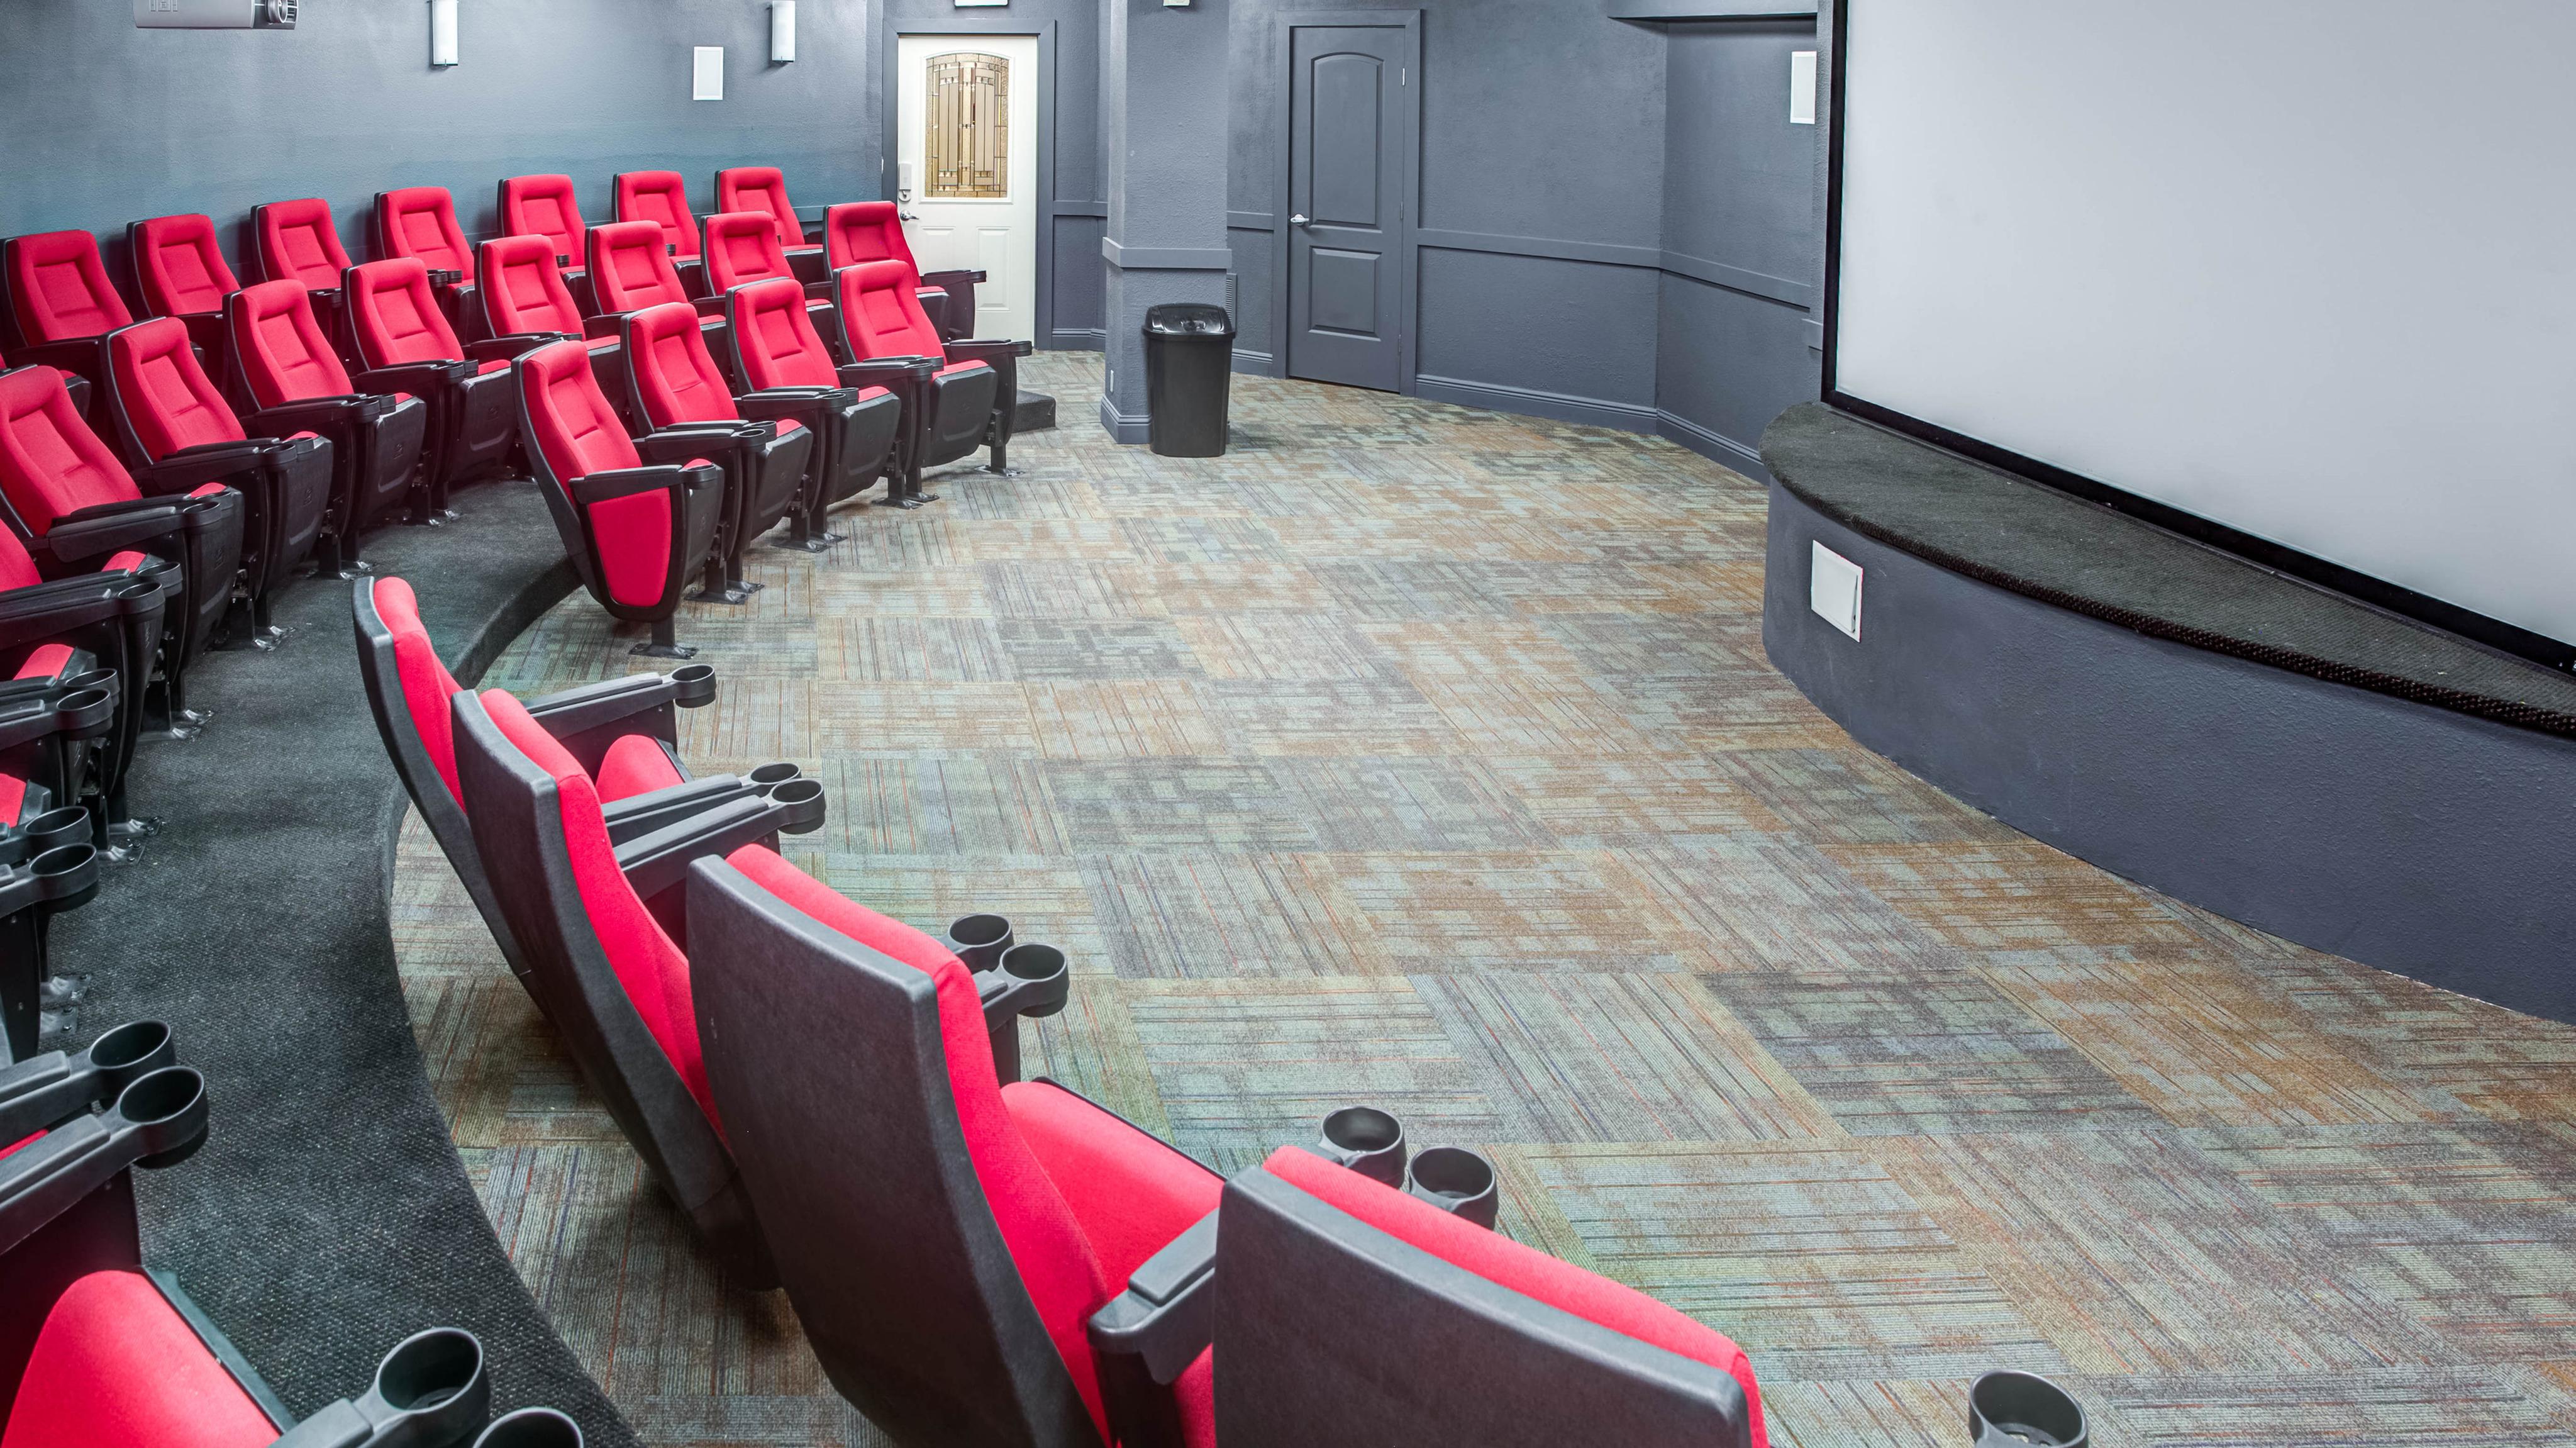 Theatre room in apartments in lubbock